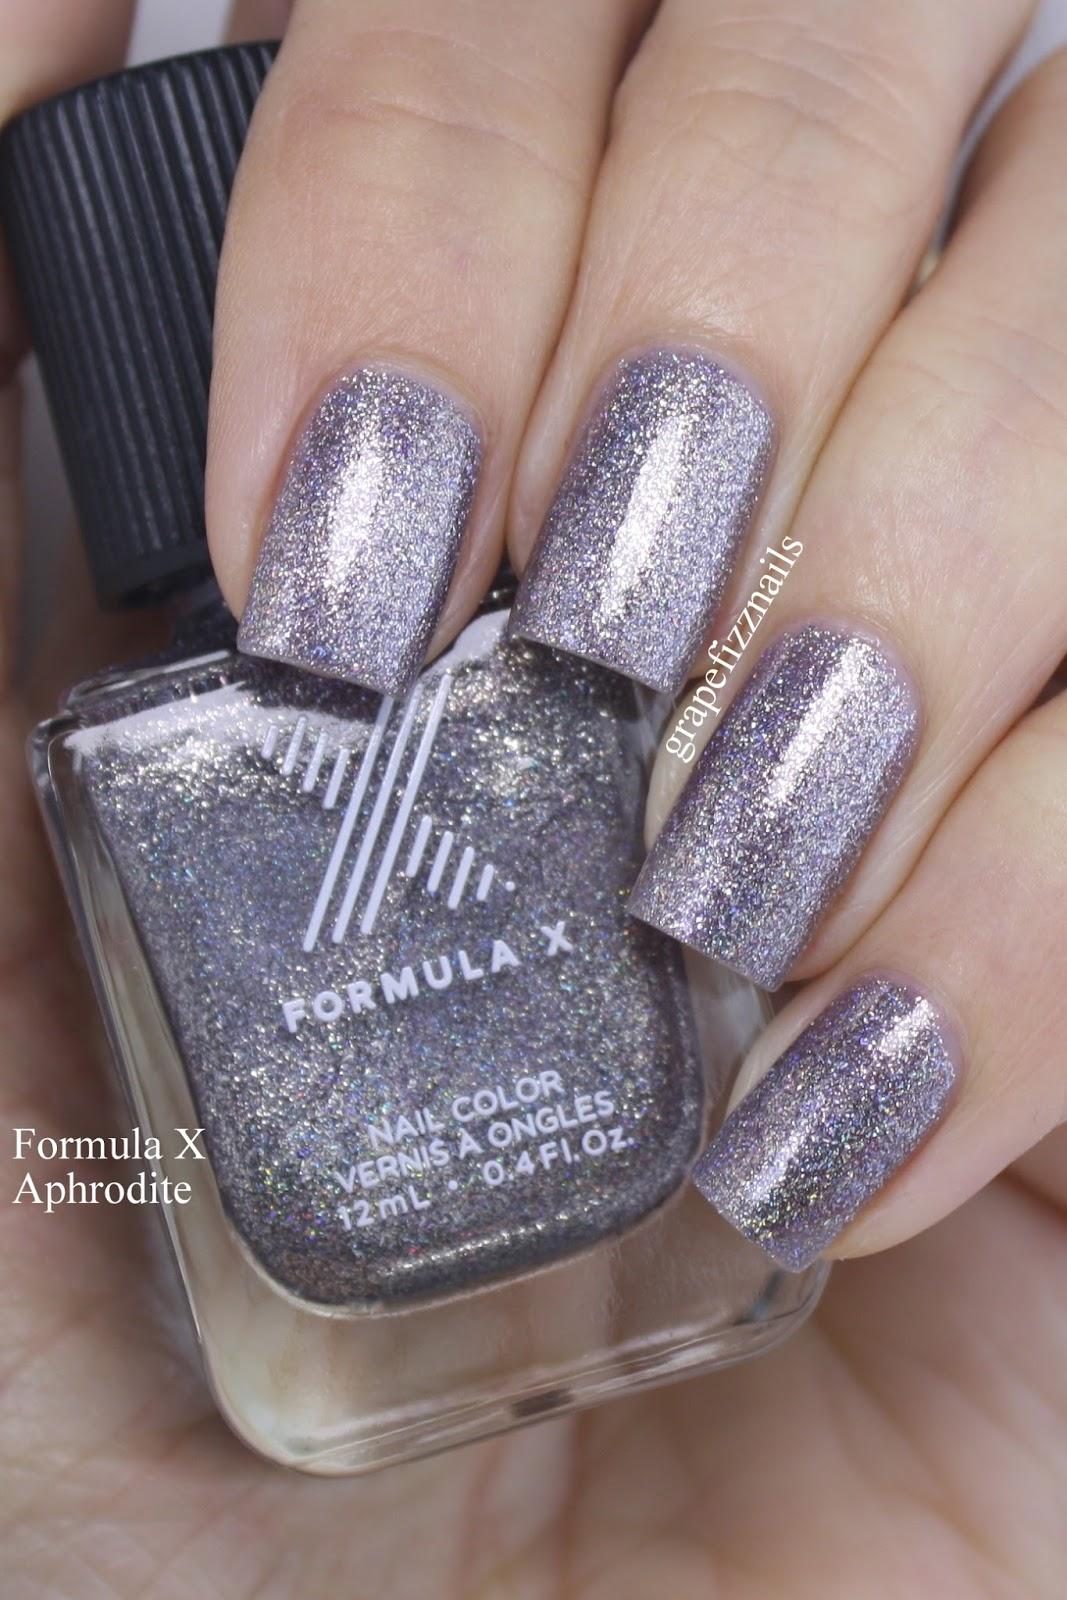 Formula X Nail Polish Nz - Creative Touch